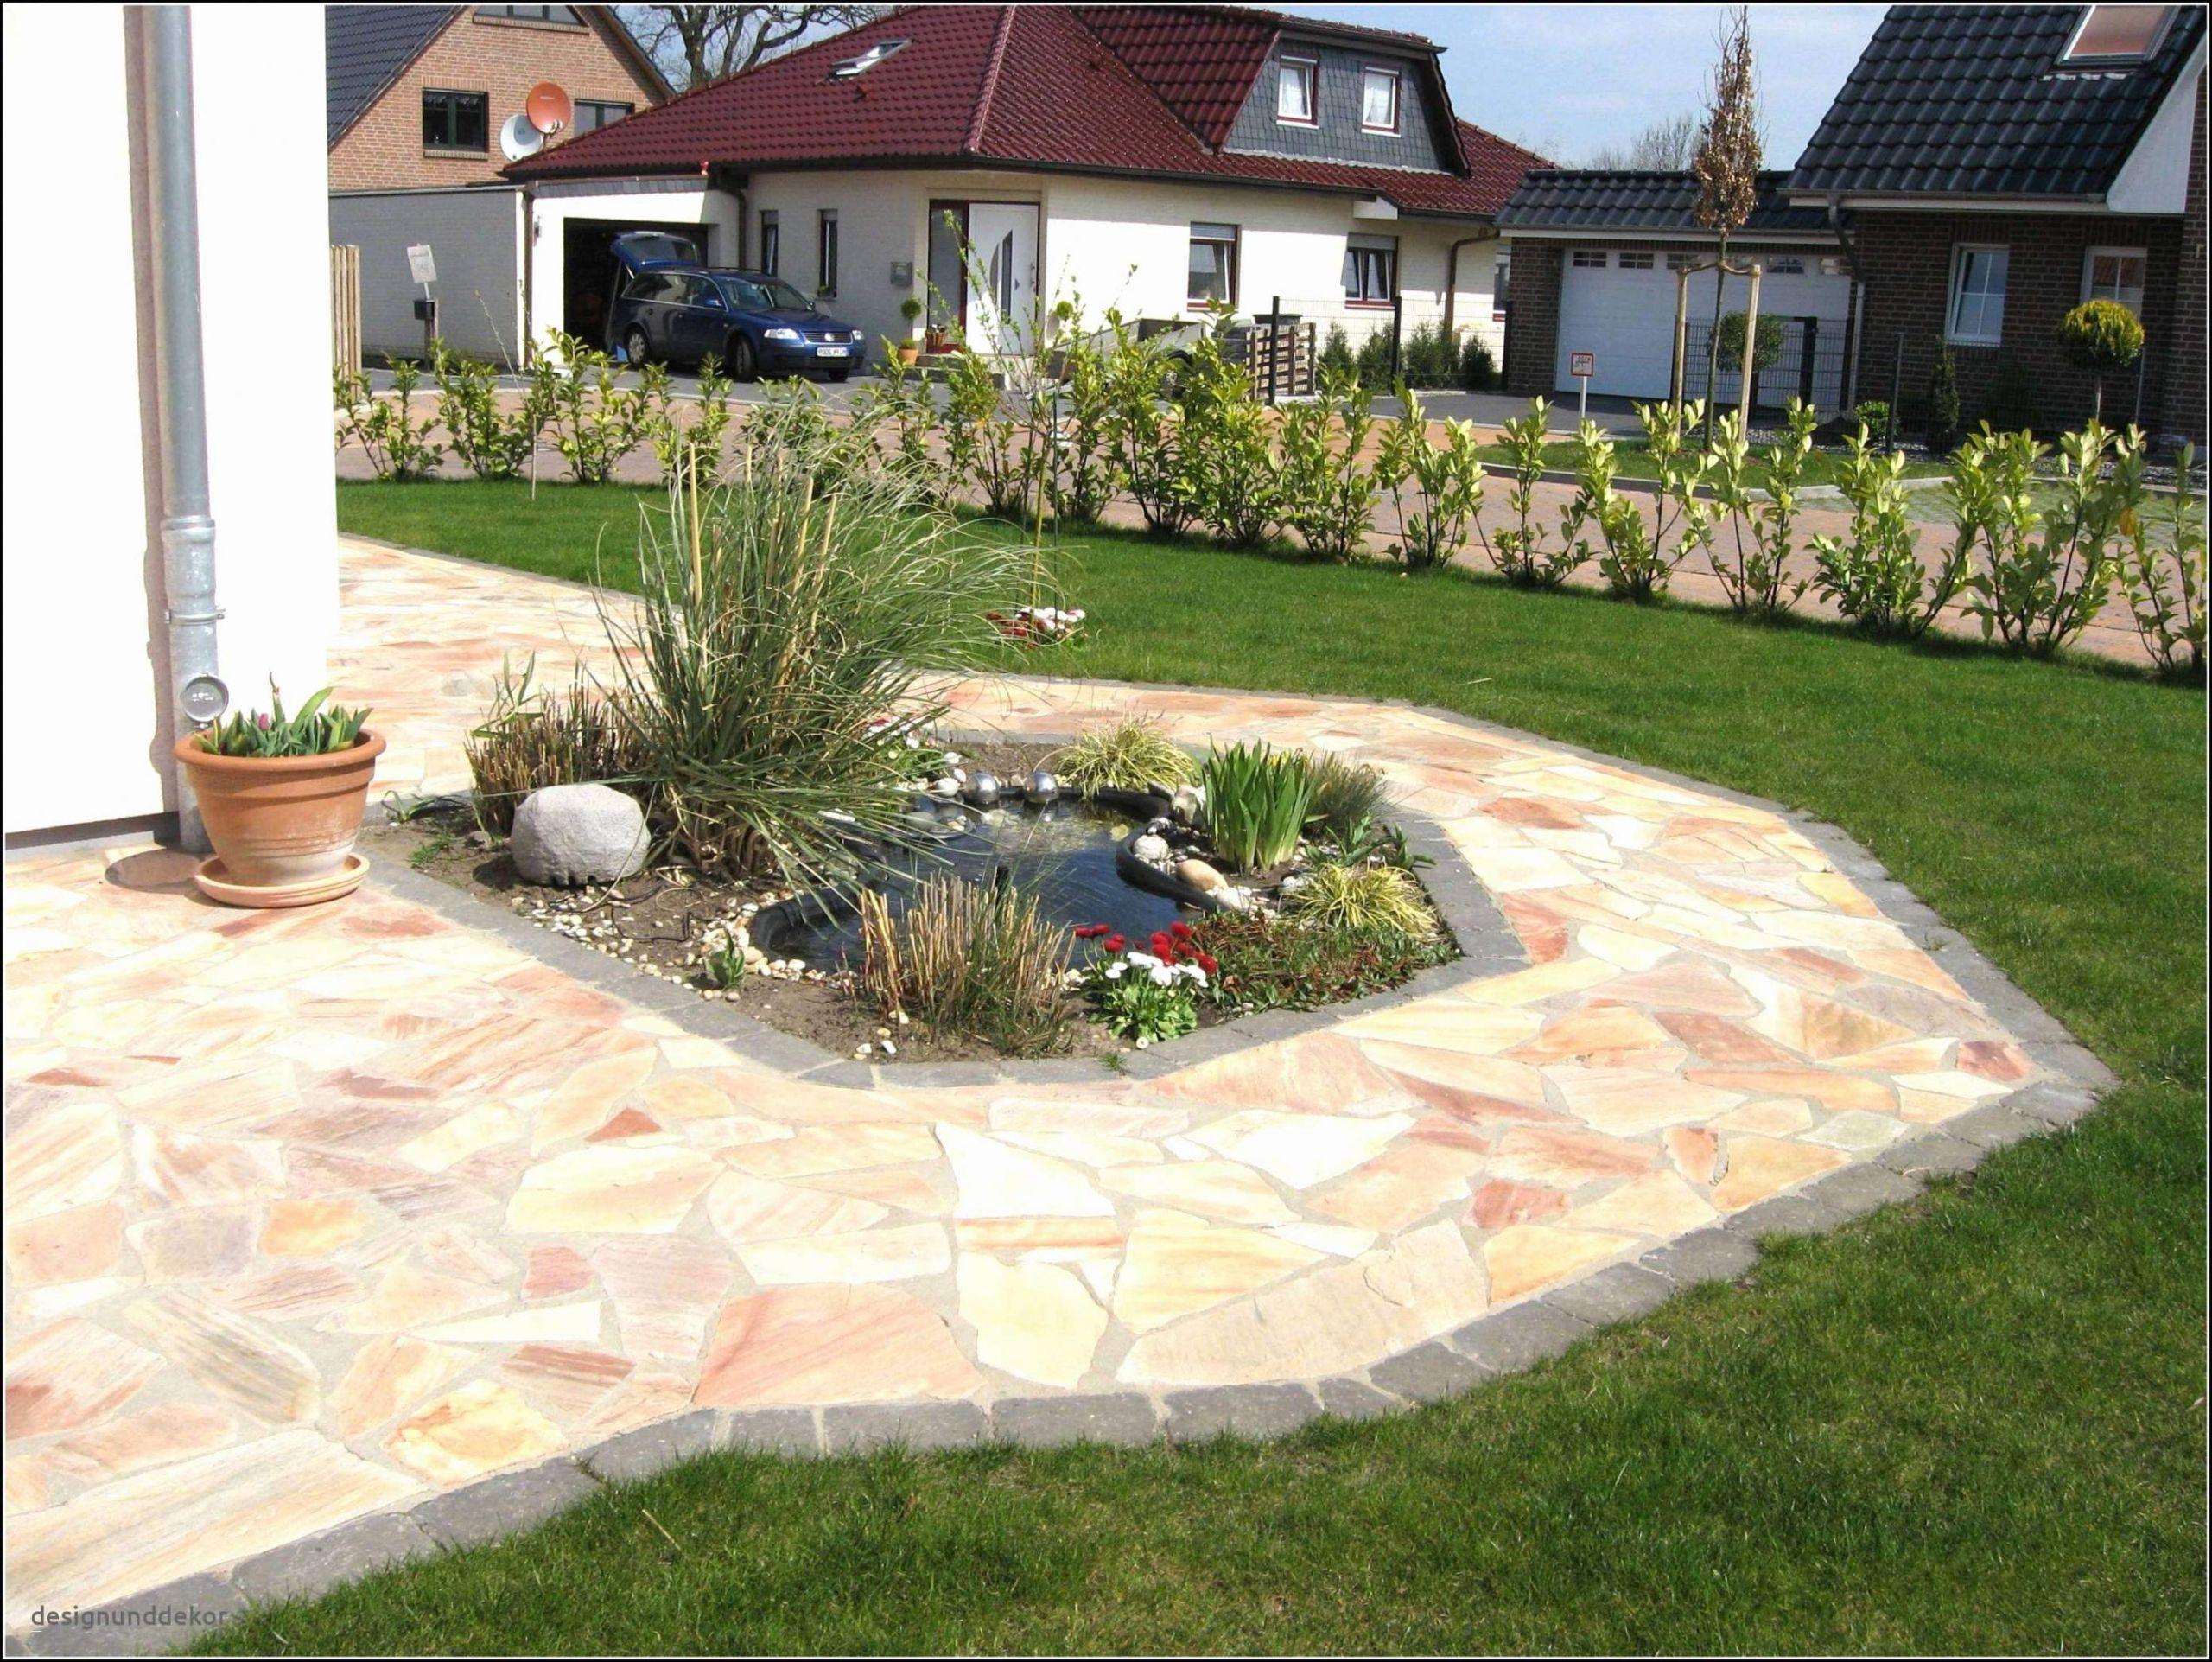 Garten Planen Beispiele Luxus Garten Gestalten Ideen — Temobardz Home Blog